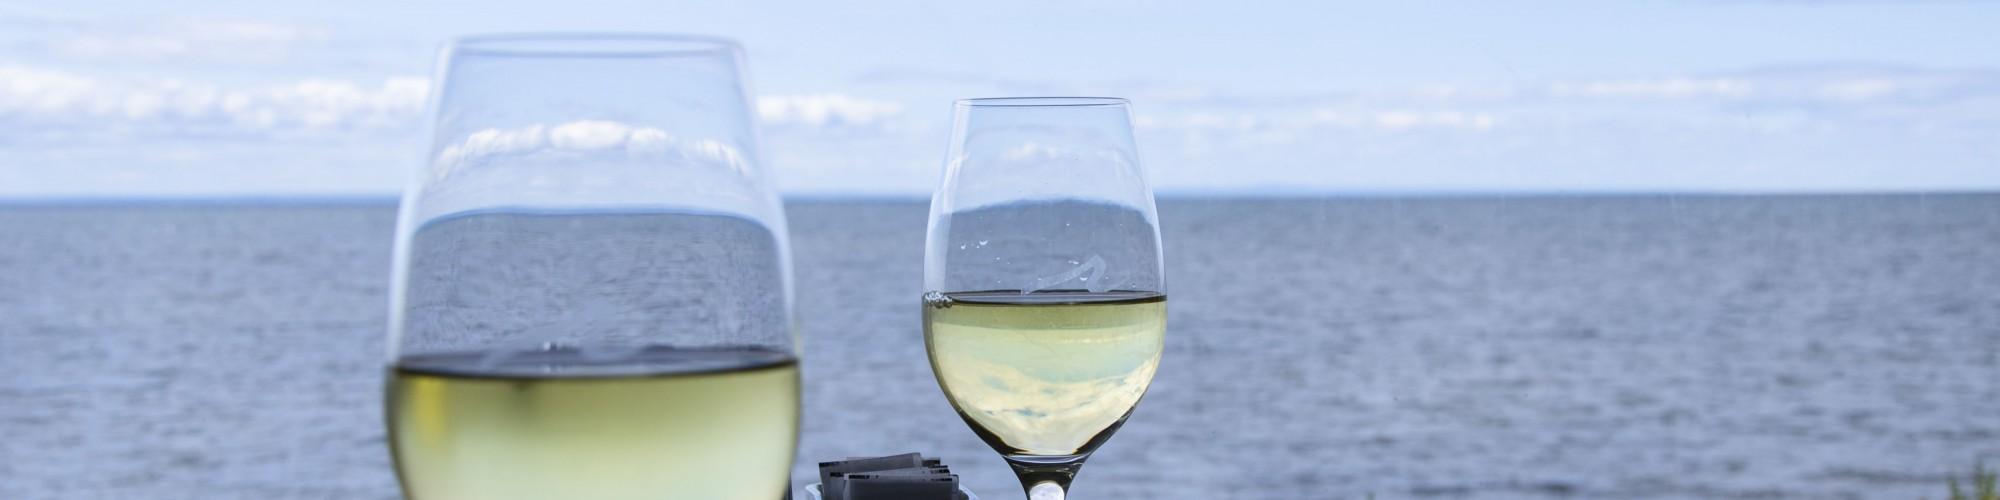 Verres de vin, restaurant, vue sur la mer, Riôtel